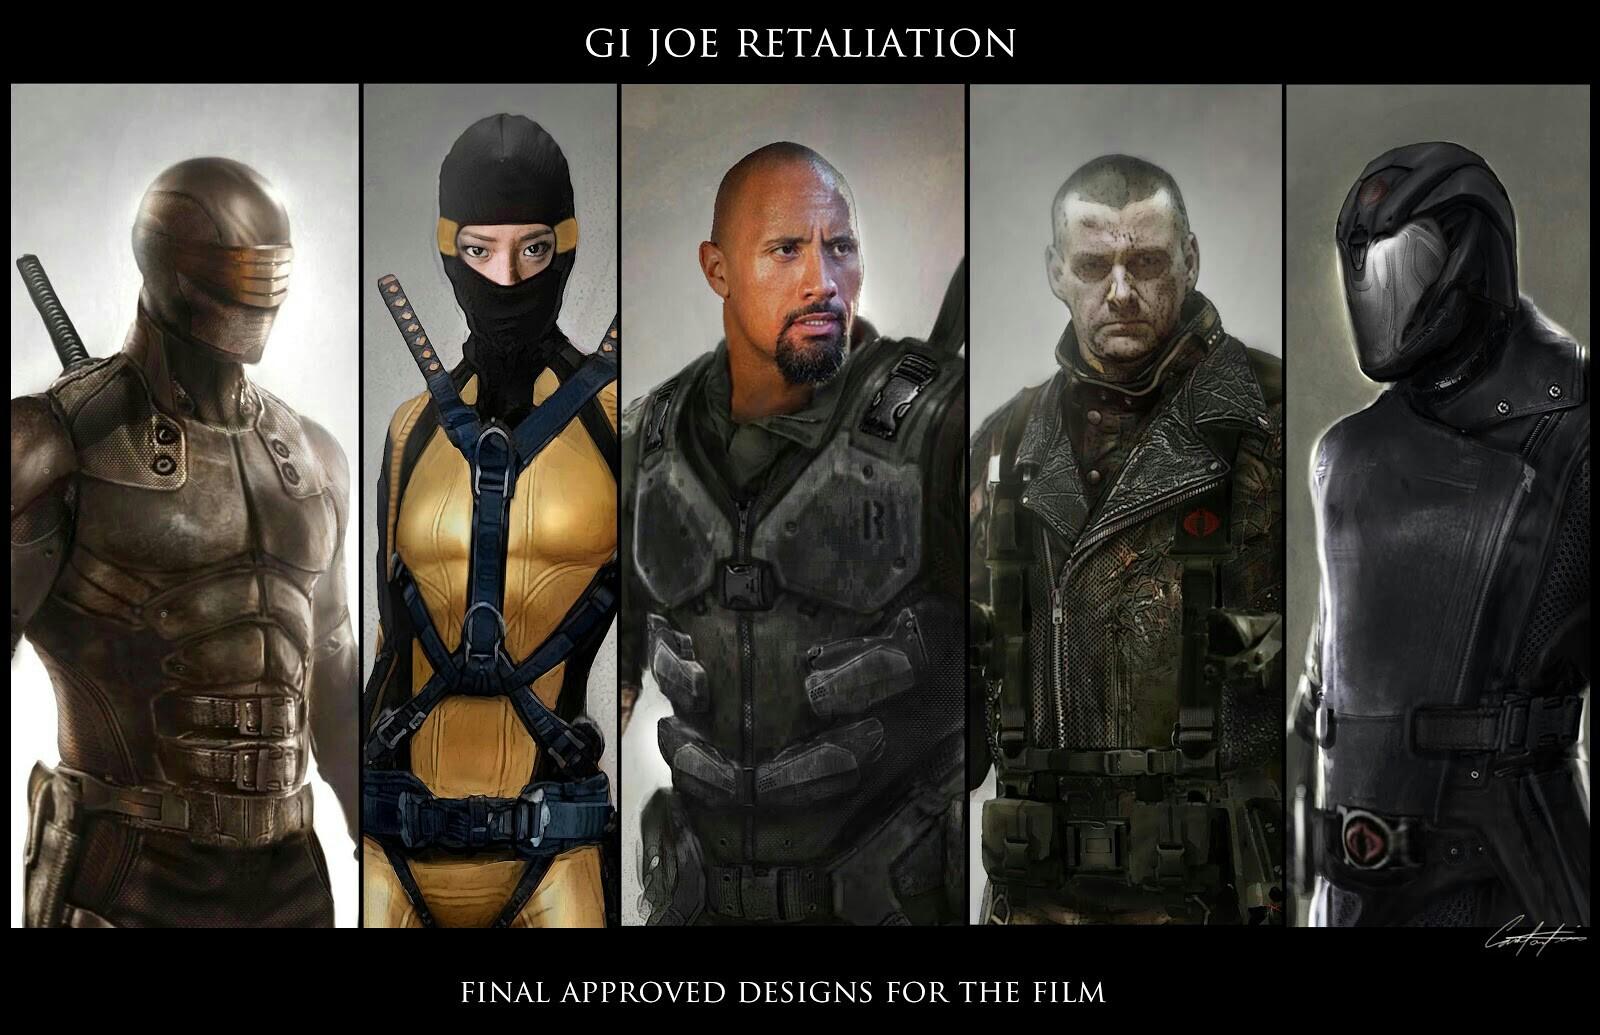 gi joe retaliation storm shadow vs snake eyes. reviews and ratings